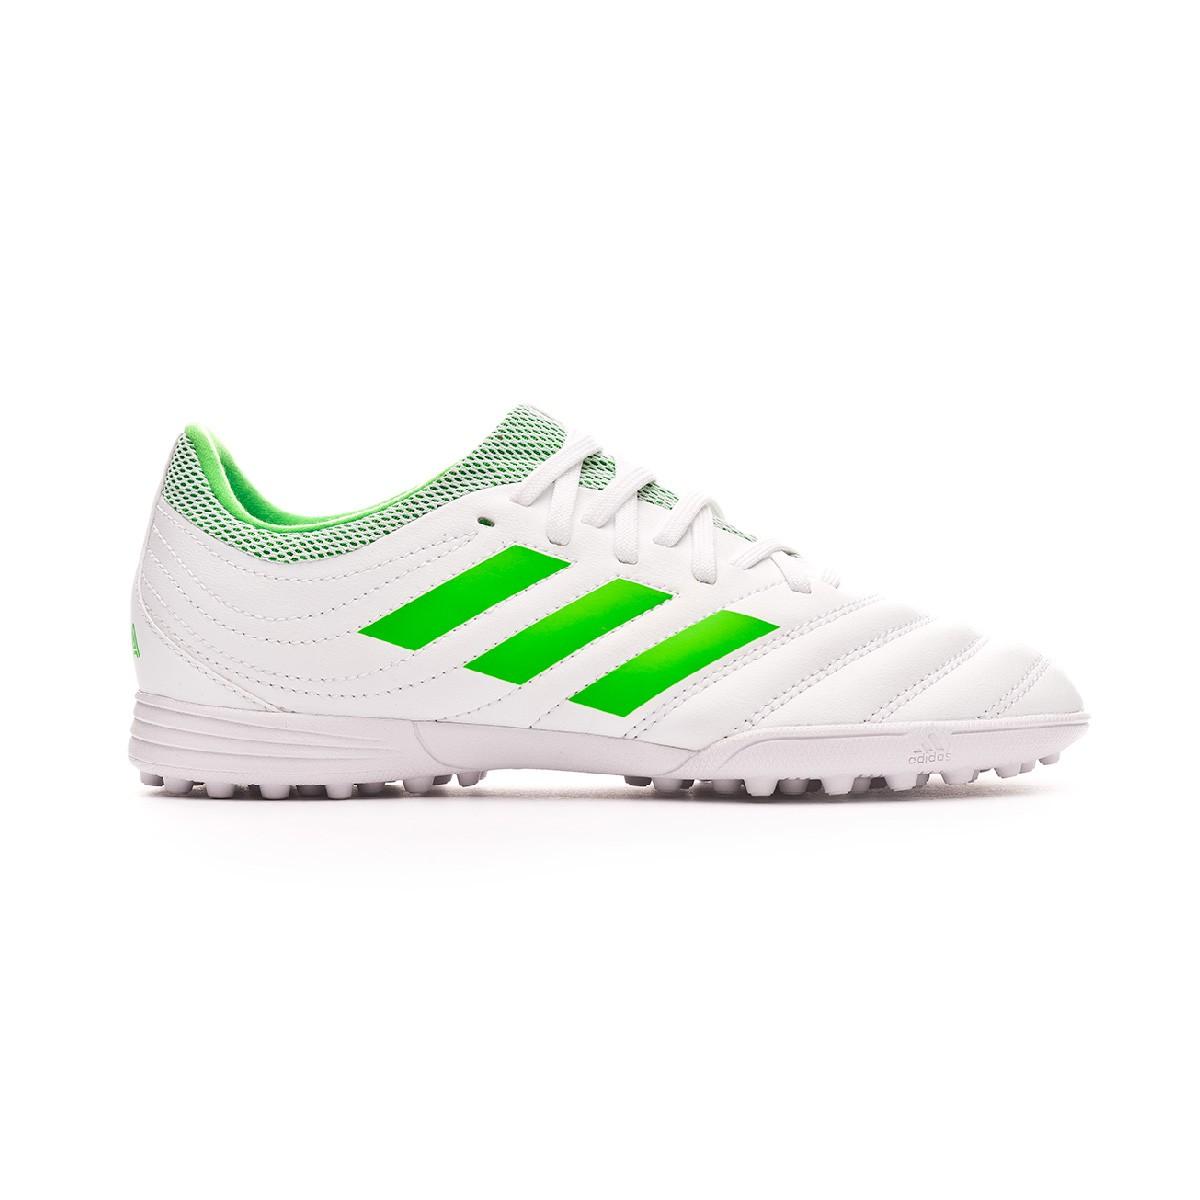 Chaussure de football adidas Copa 19.3 Turf enfant